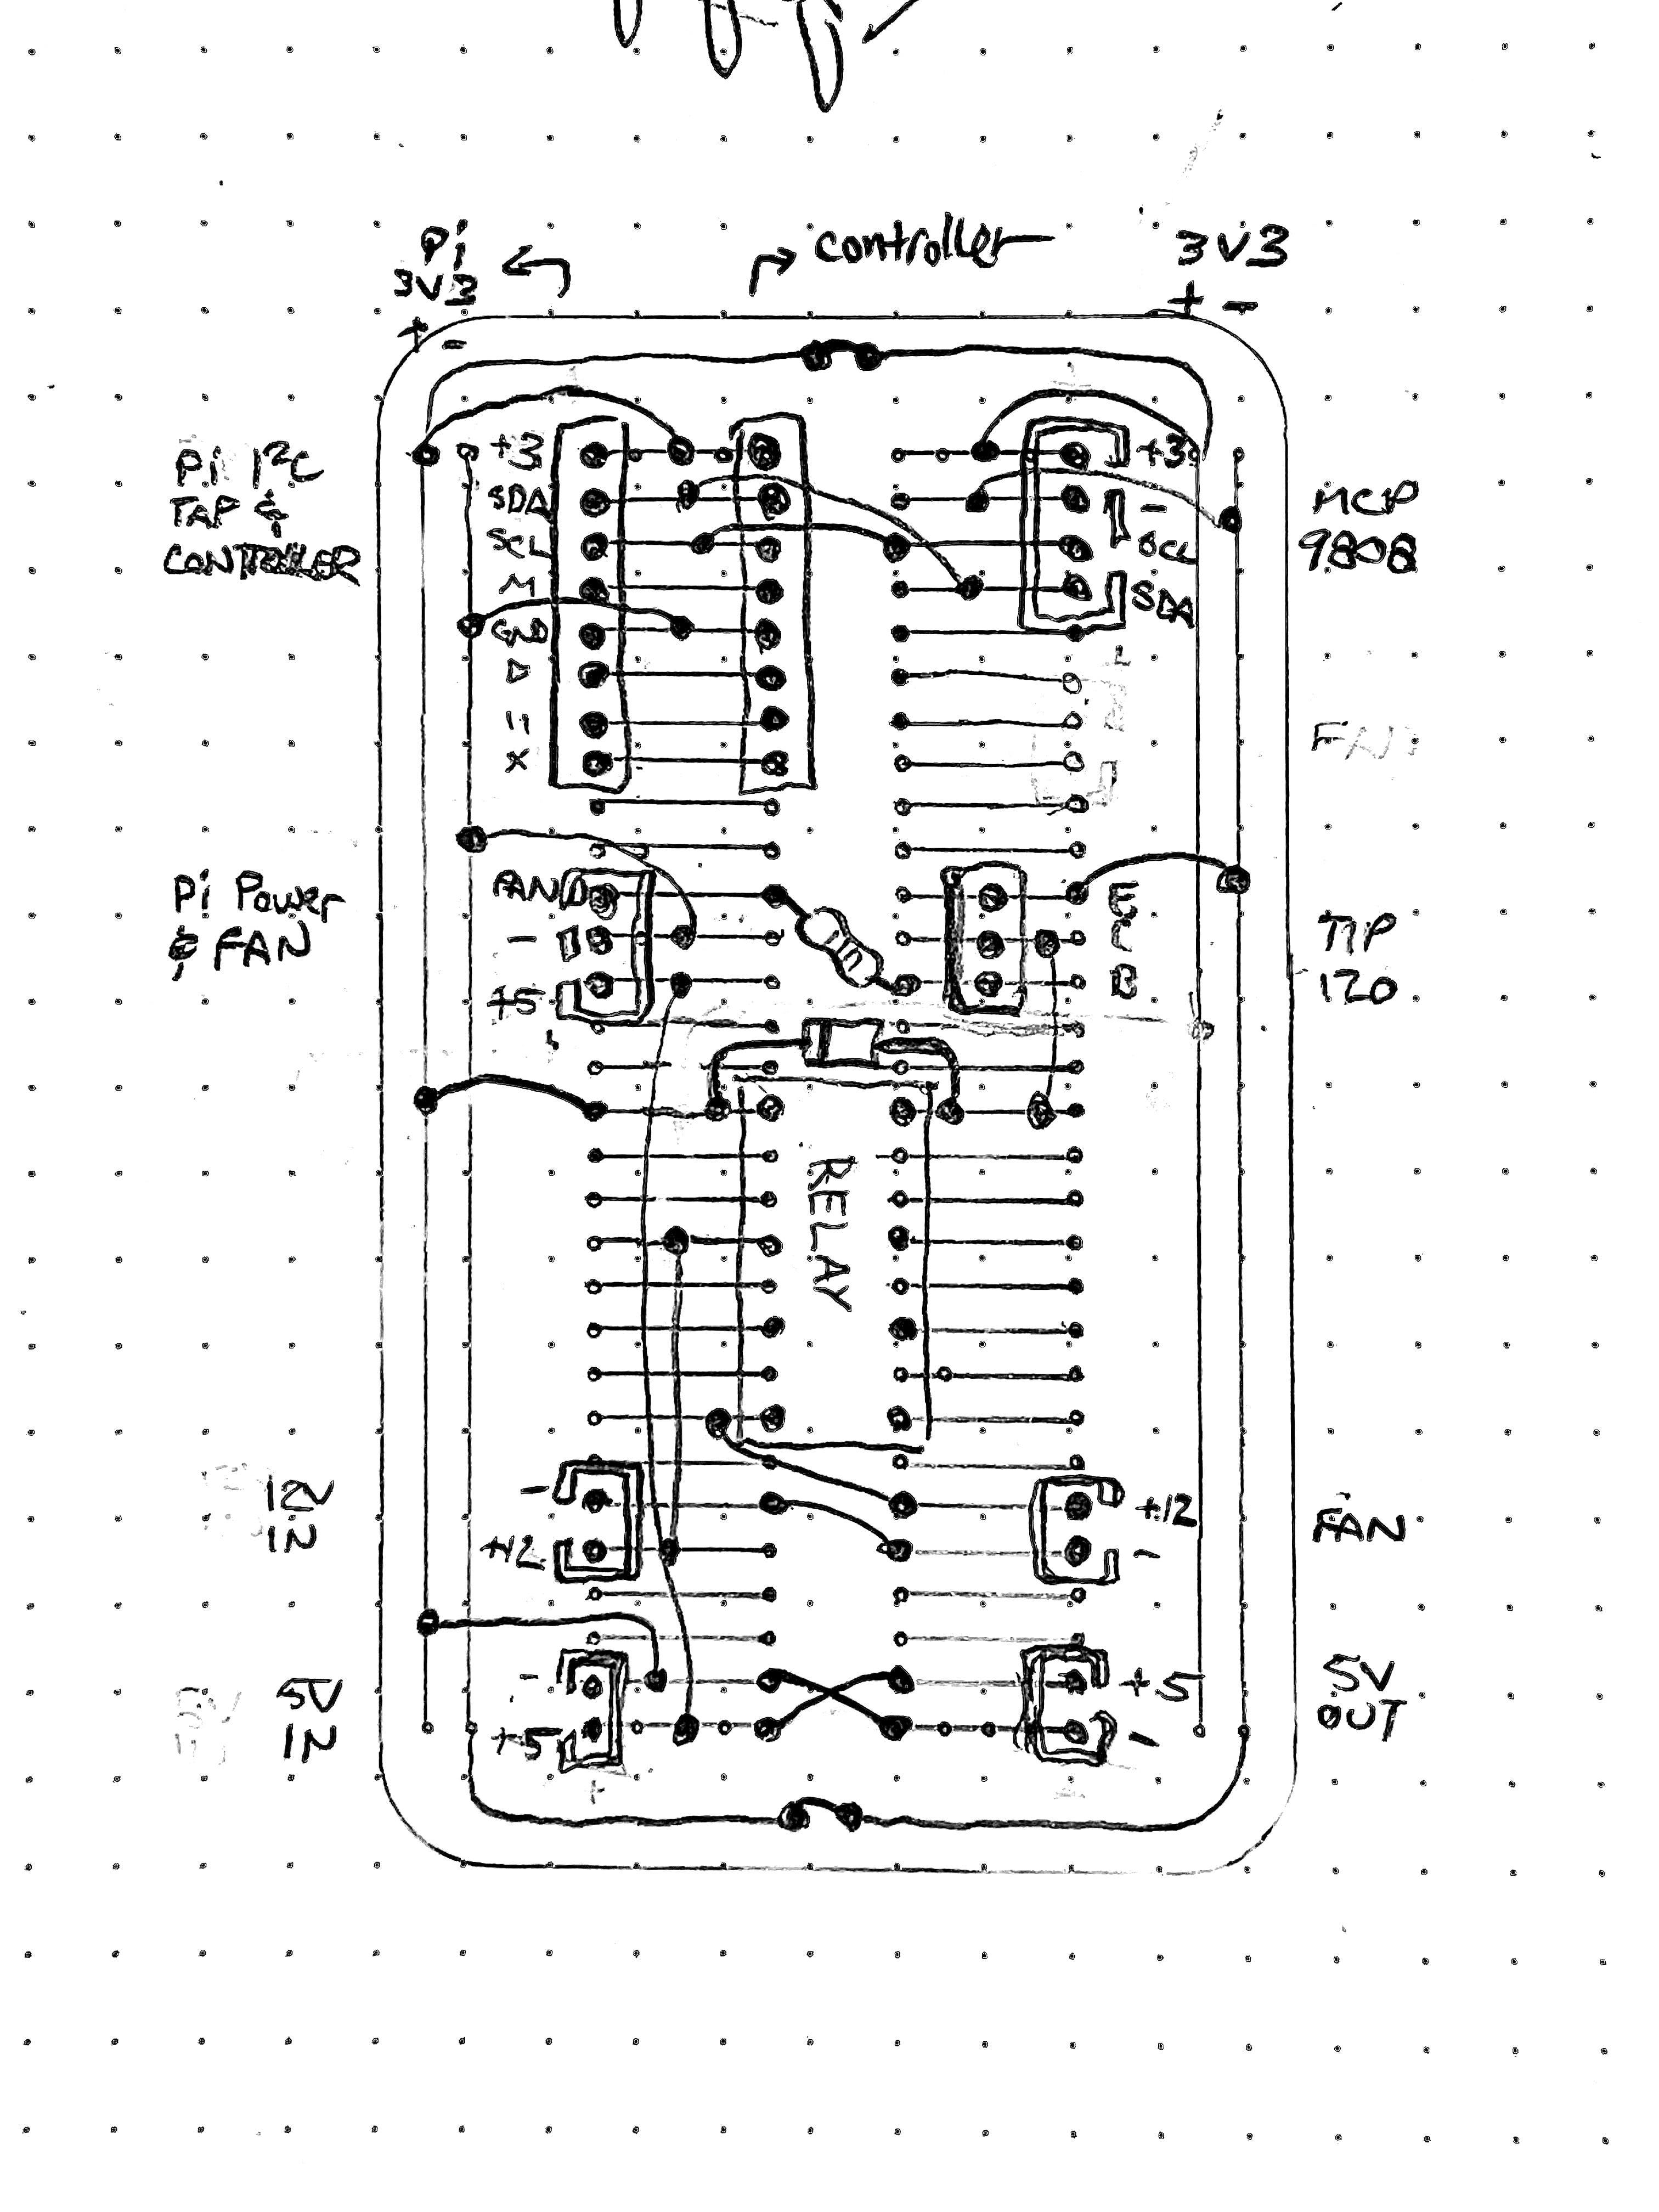 5 - relay board.jpg